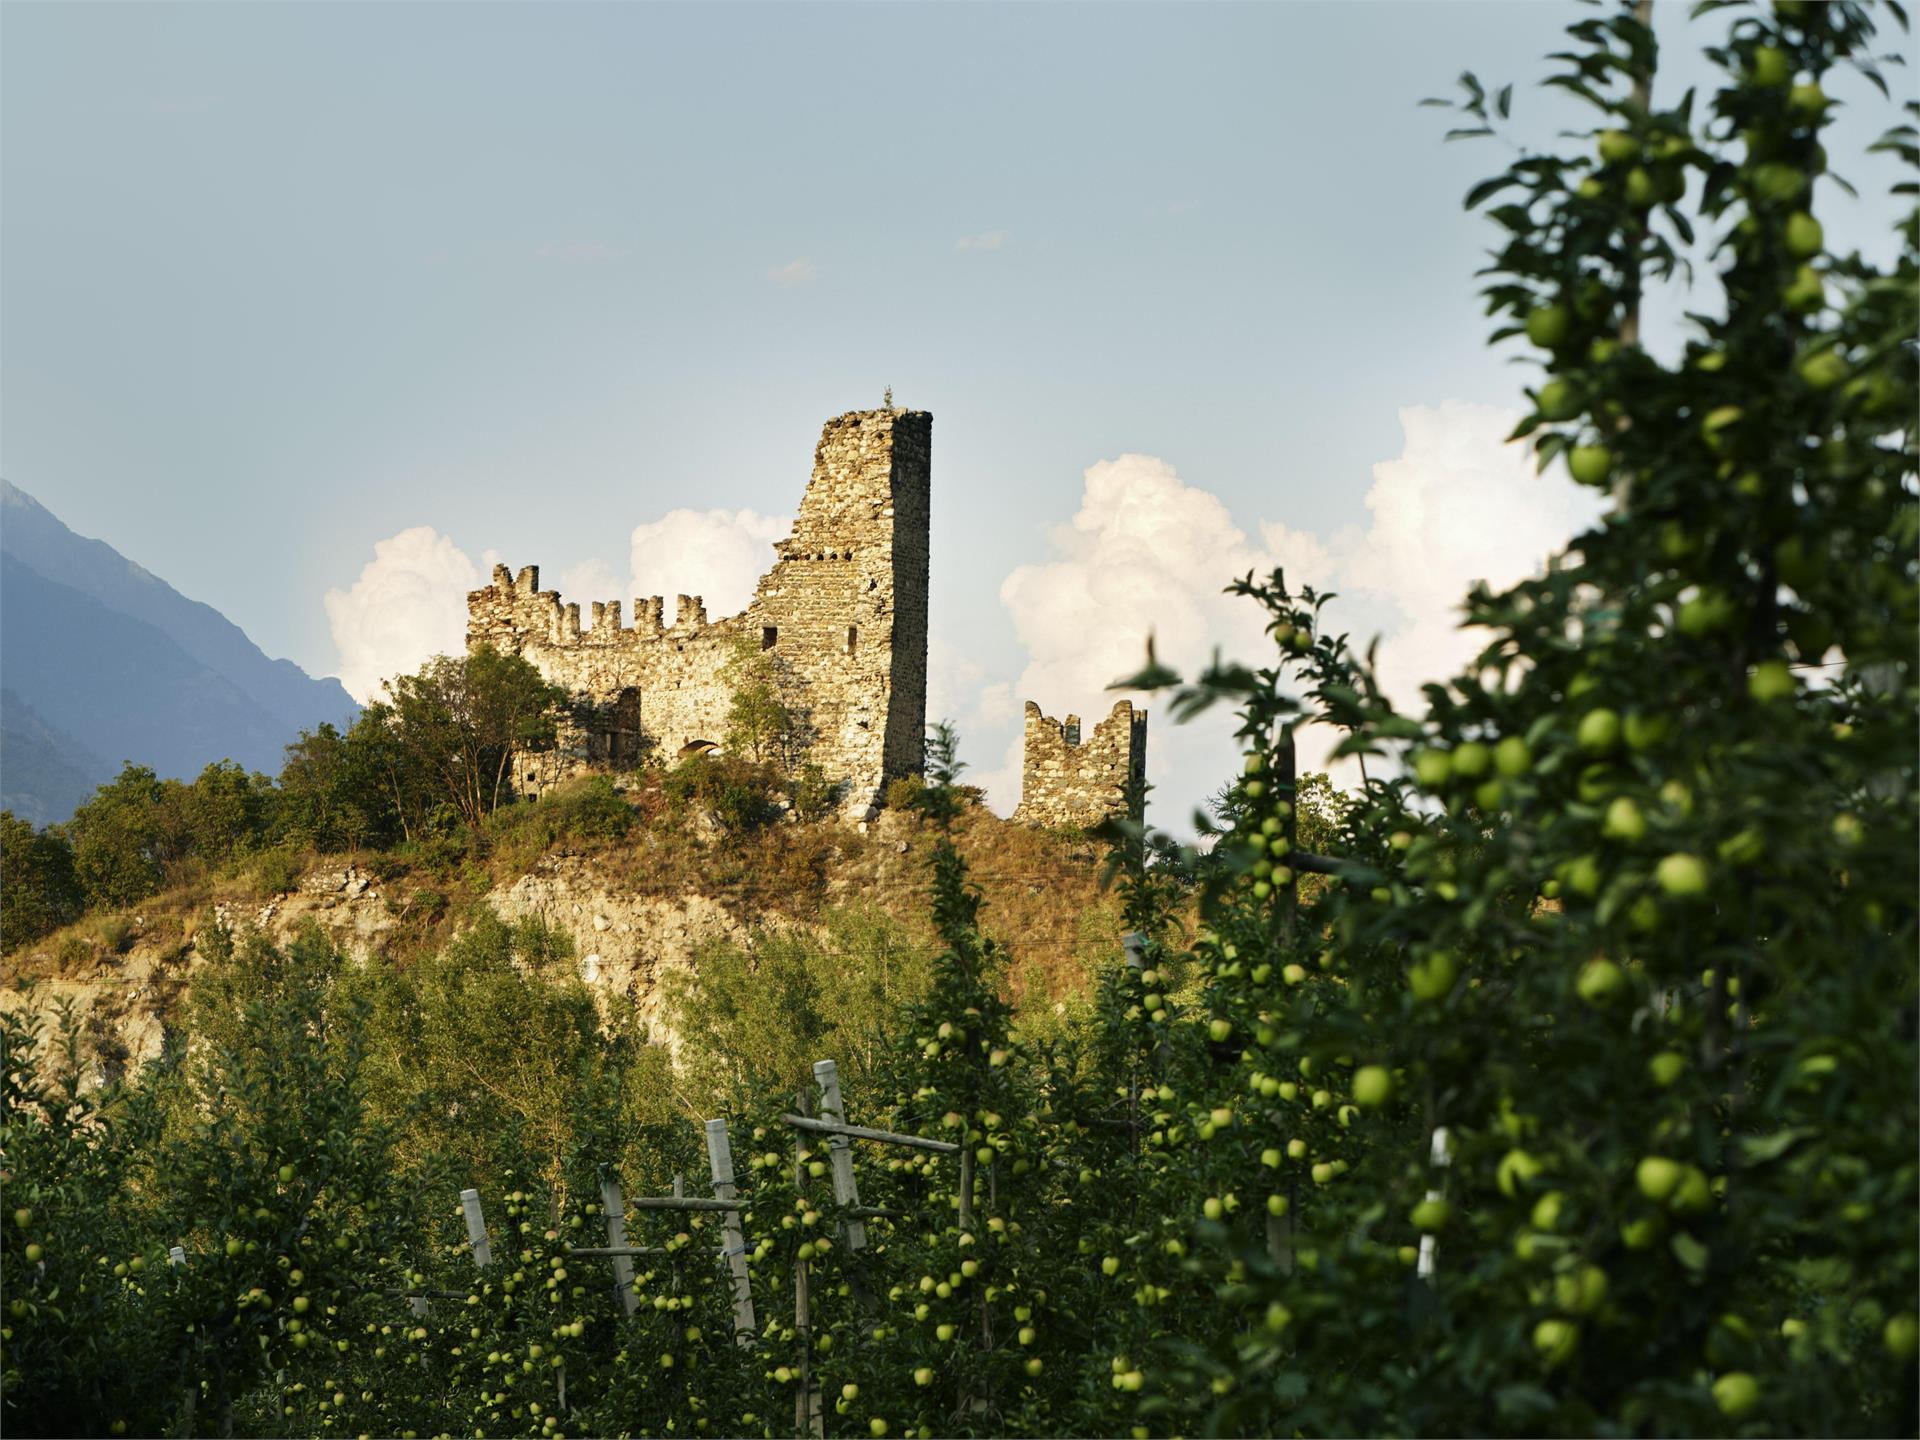 Burg Untermontani (Ruine)